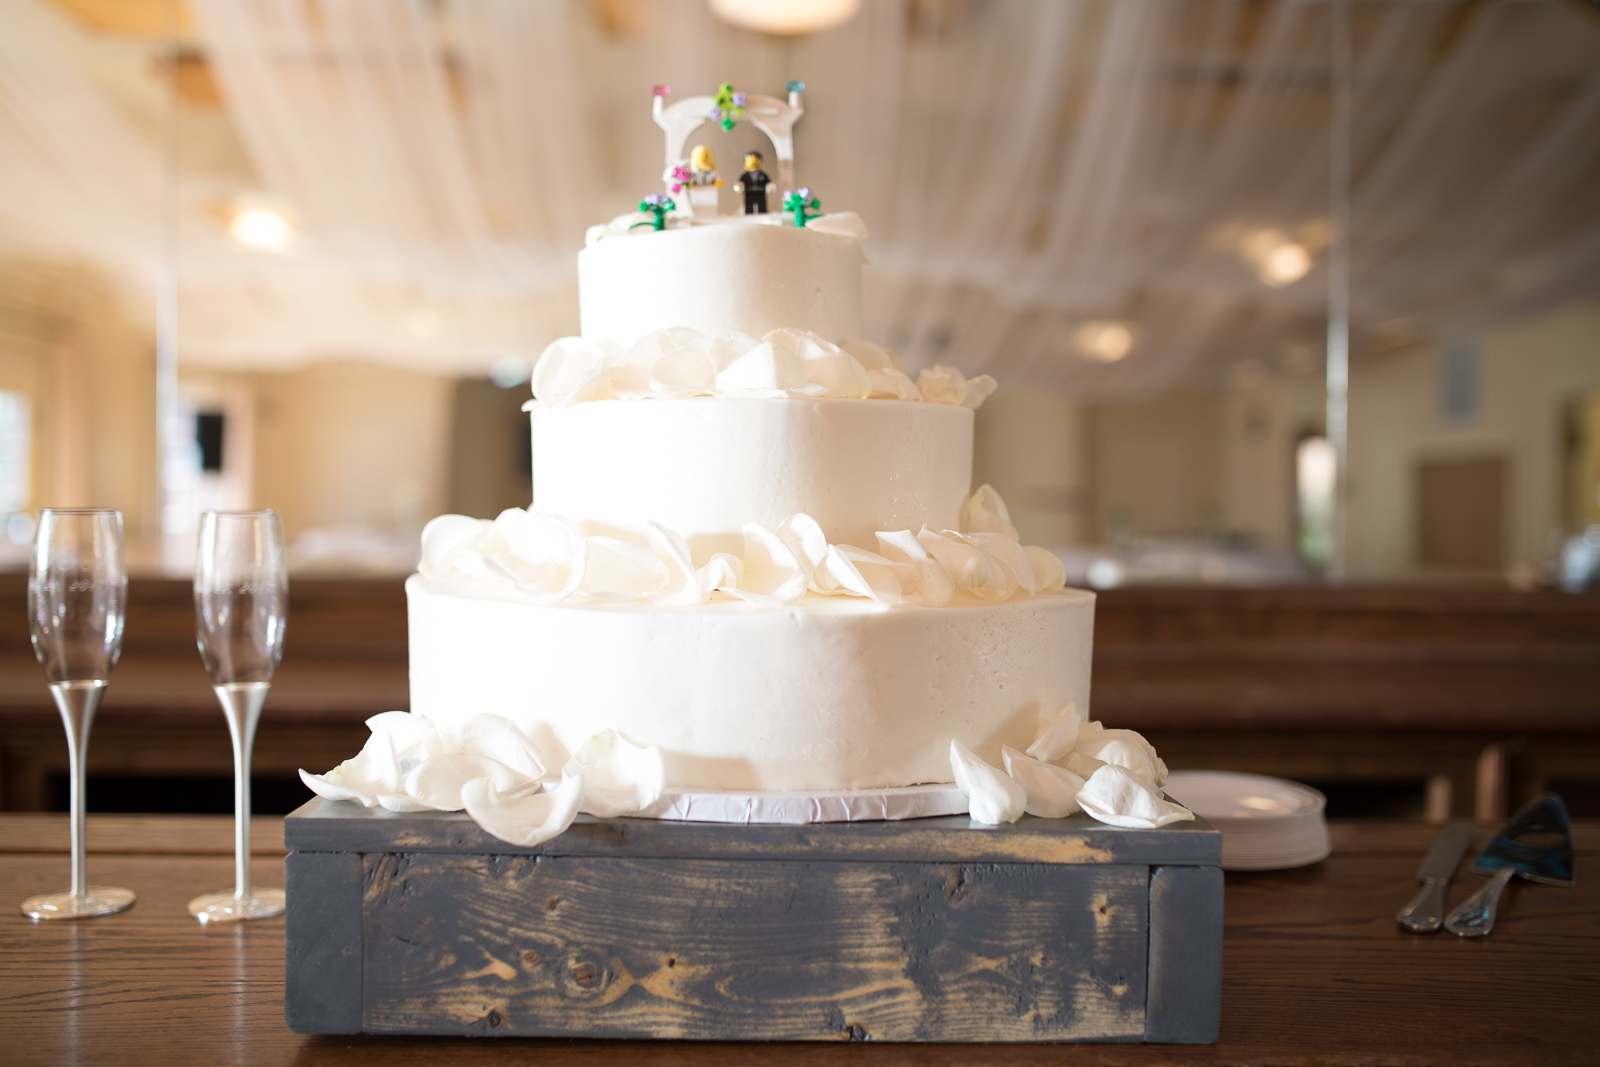 LEGO Themed Wedding by Wyoming Wedding Photographer, Megan Lee Photography